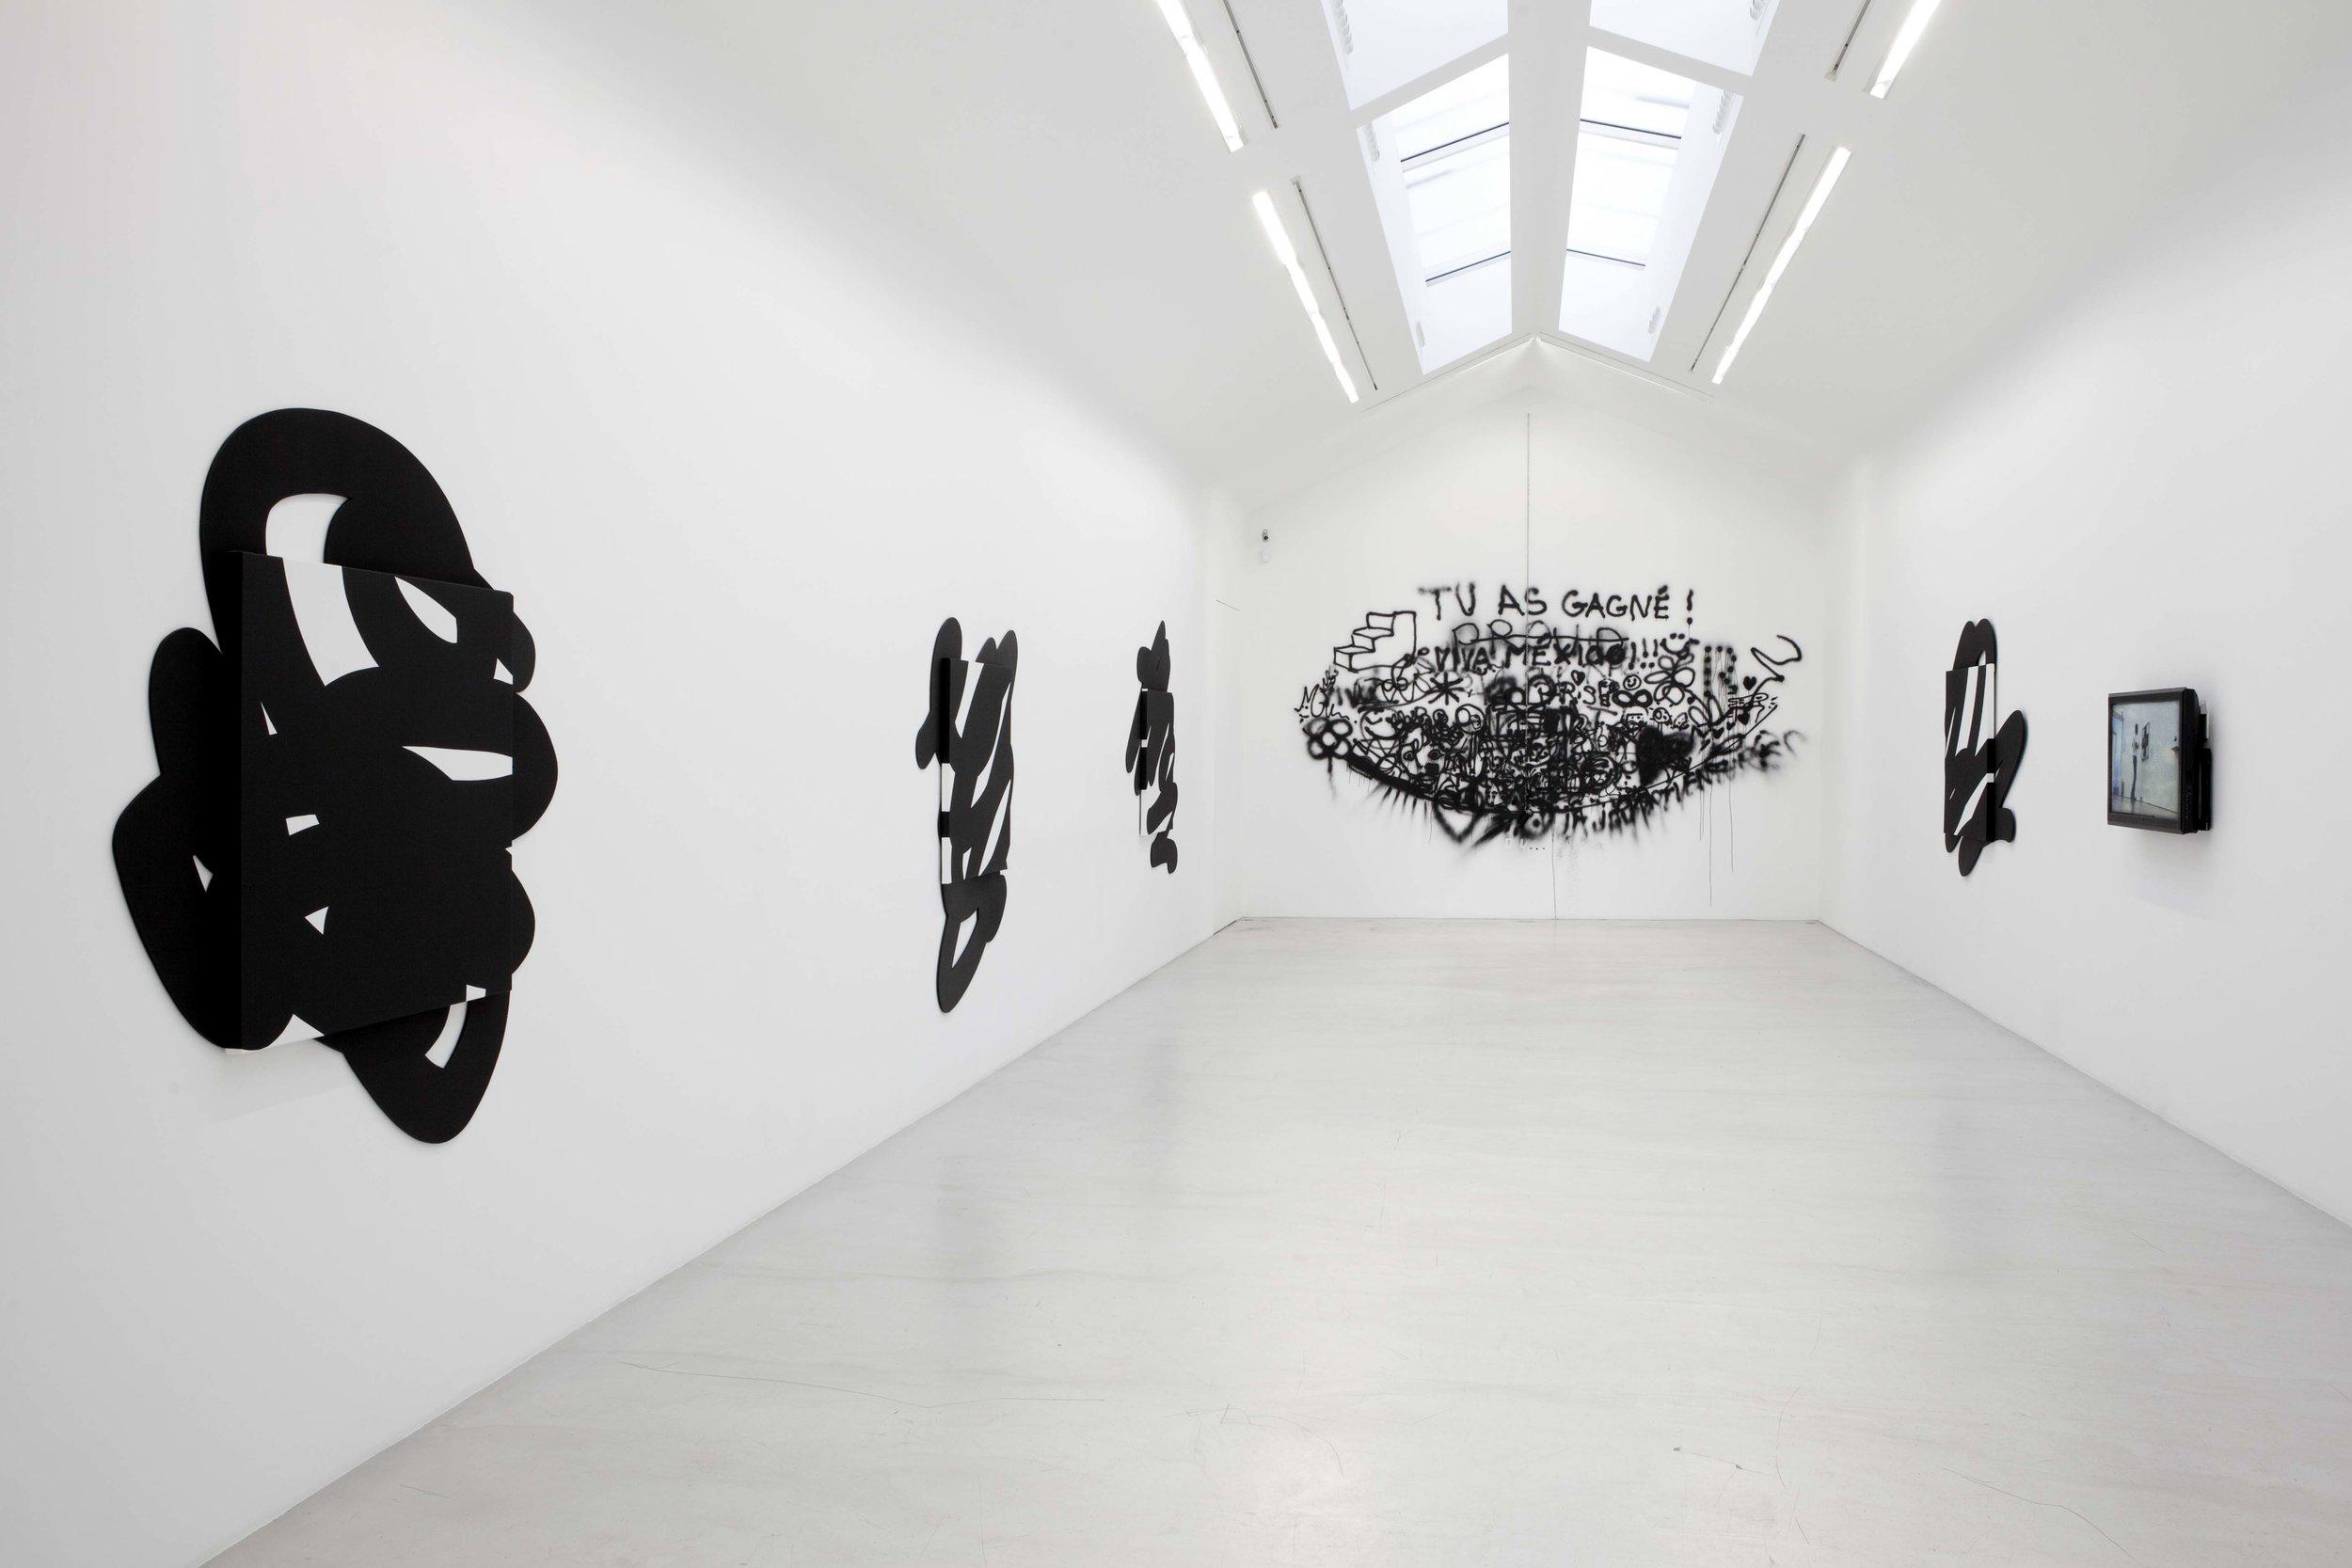 Caliente Exhibition, 2011.